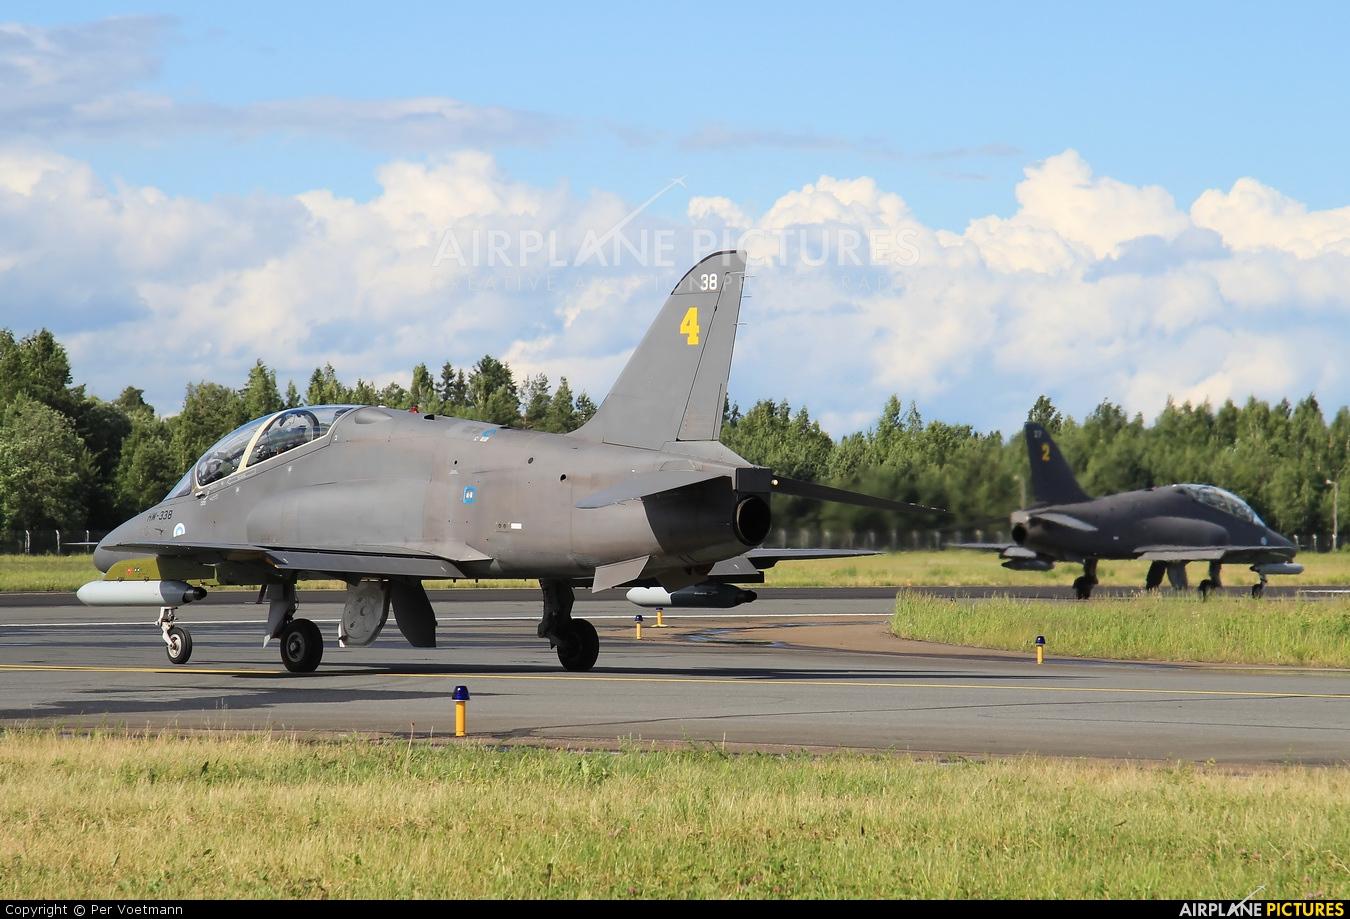 Finland - Air Force: Midnight Hawks HW-338 aircraft at Lappeenranta